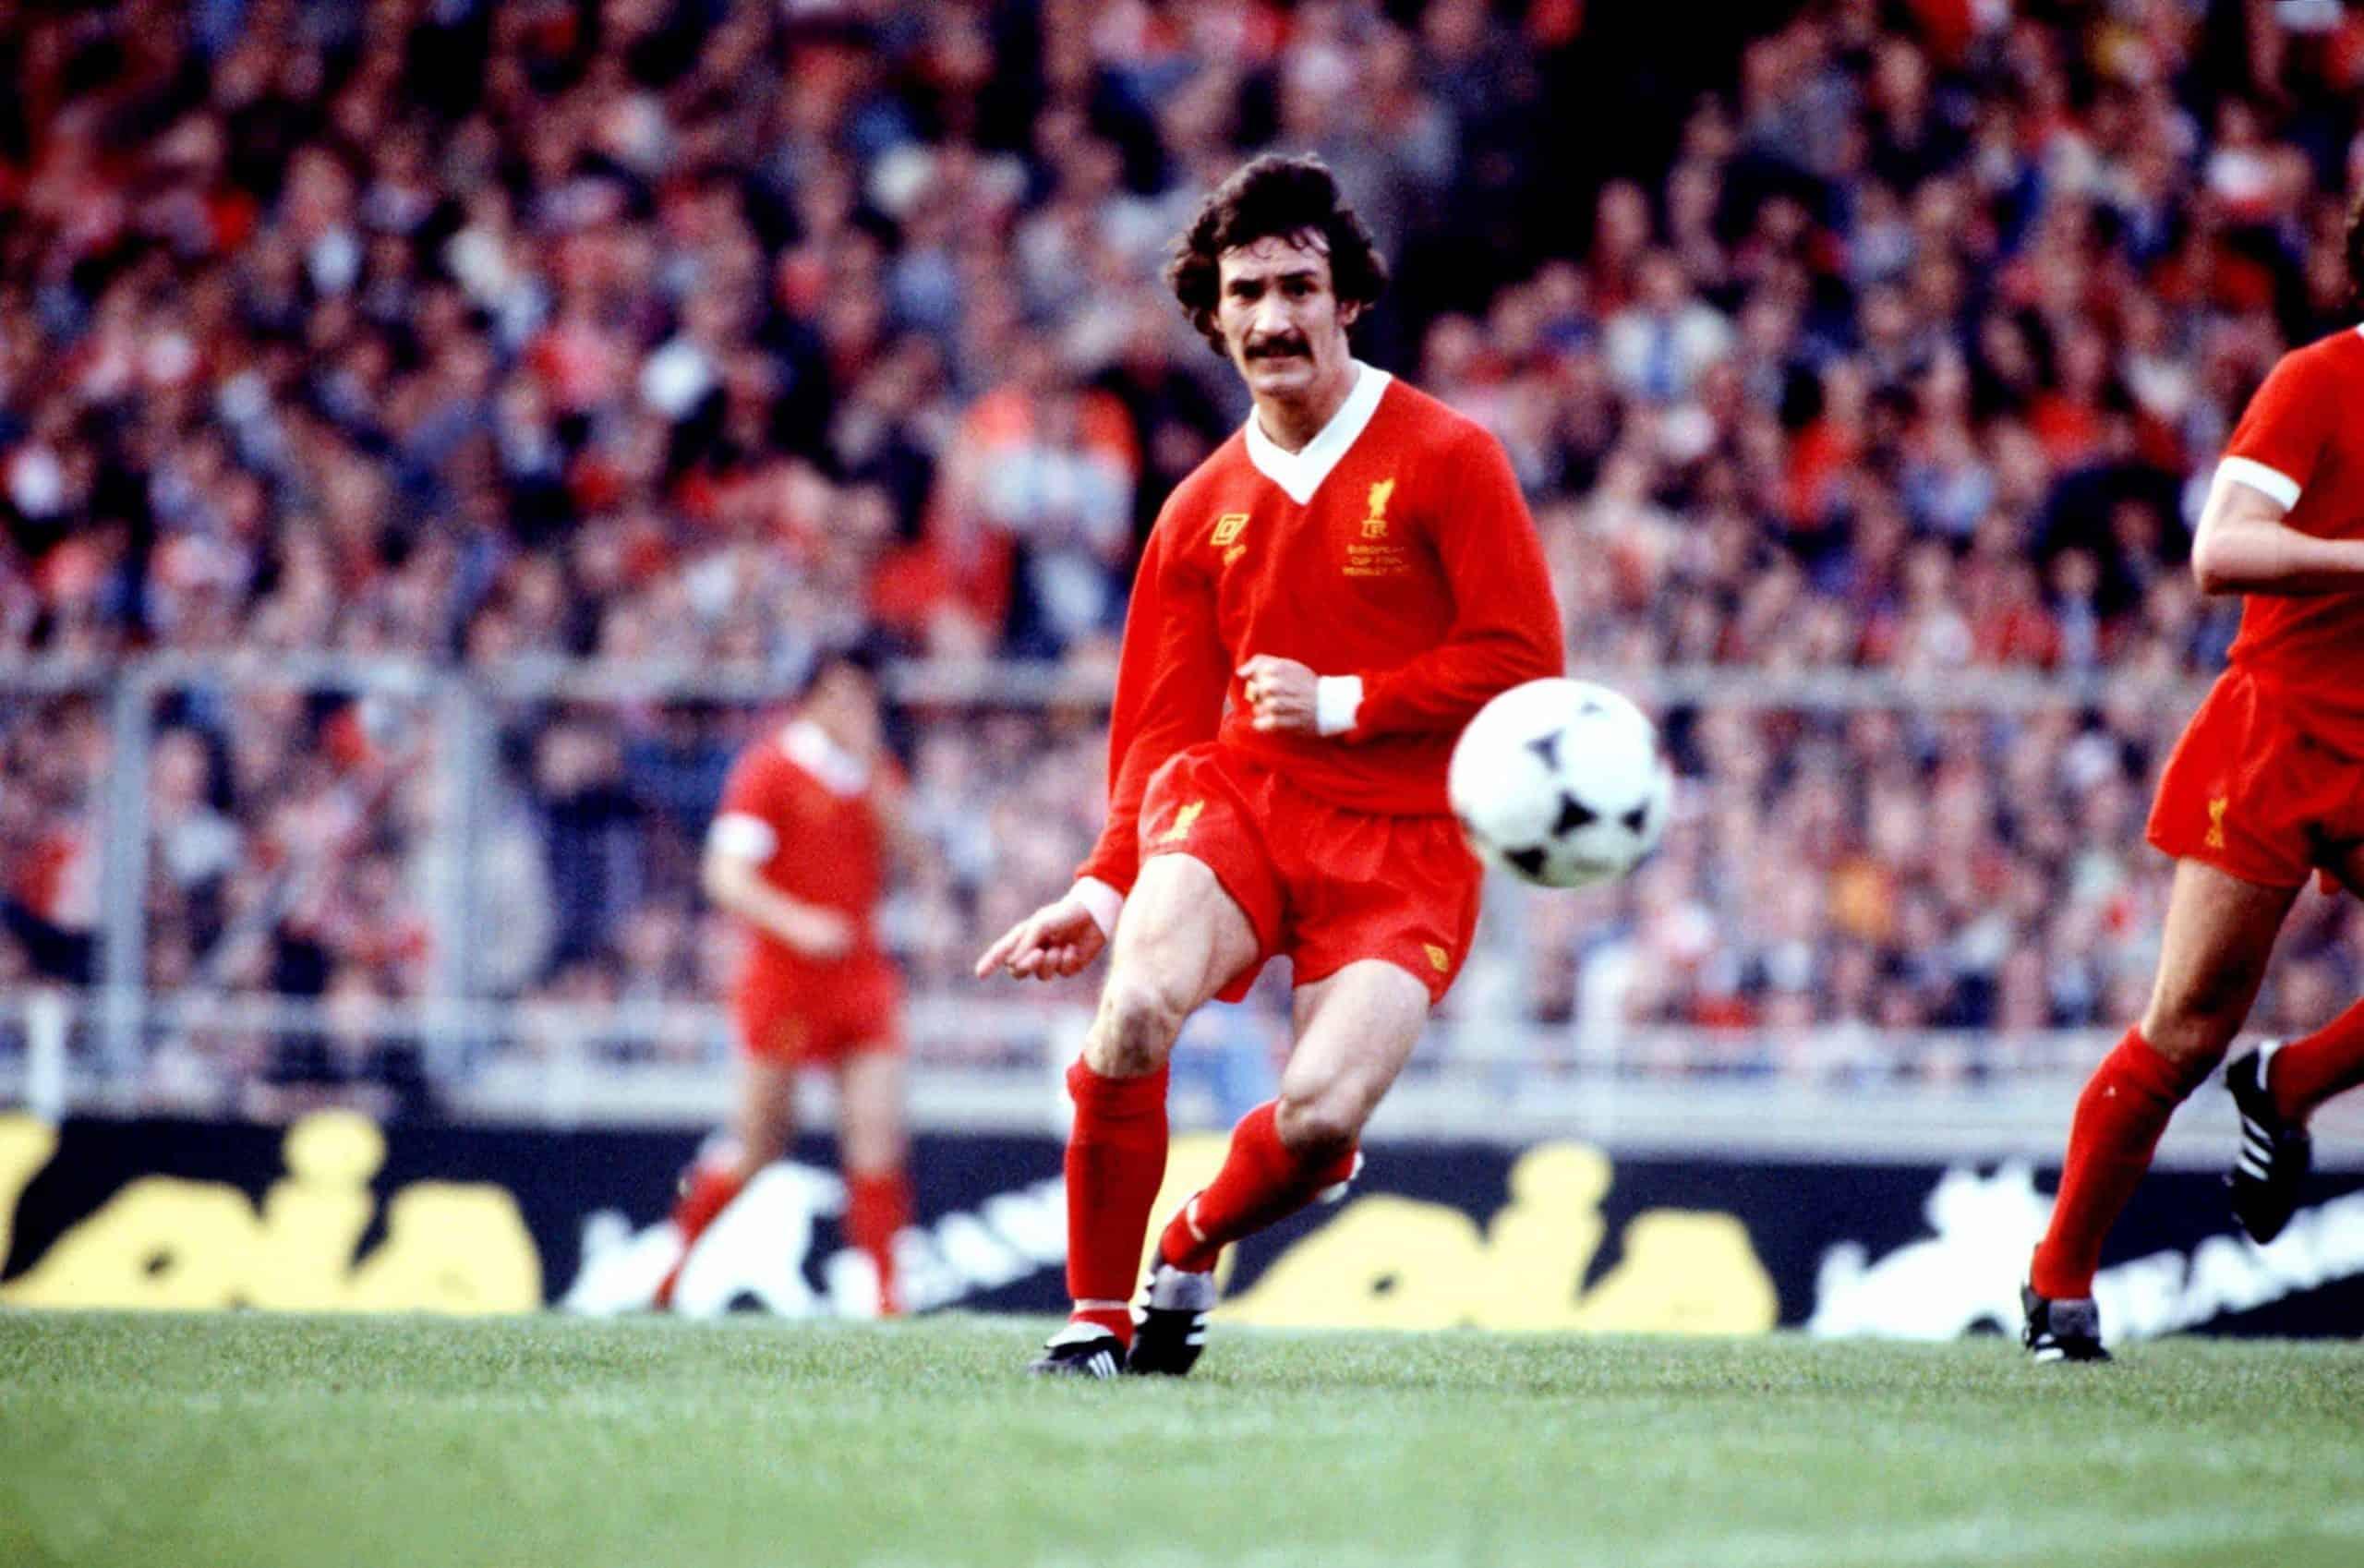 Terry McDermott, Liverpool (Peter Robinson/EMPICS Sport) 10-May-1978